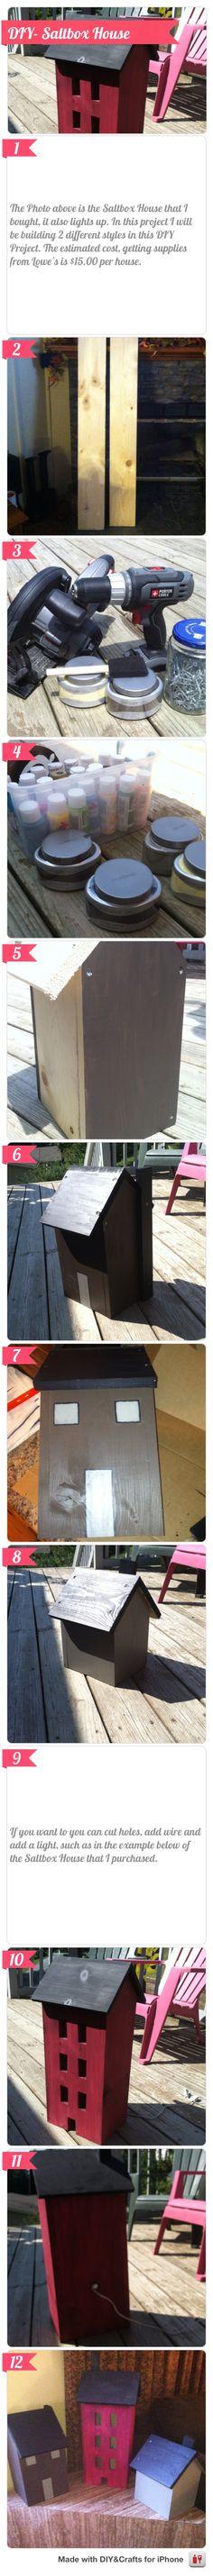 DIY- Saltbox House #DIYCraftsEditor #DIY #iOS @DIY & Crafts Editor iPhone App